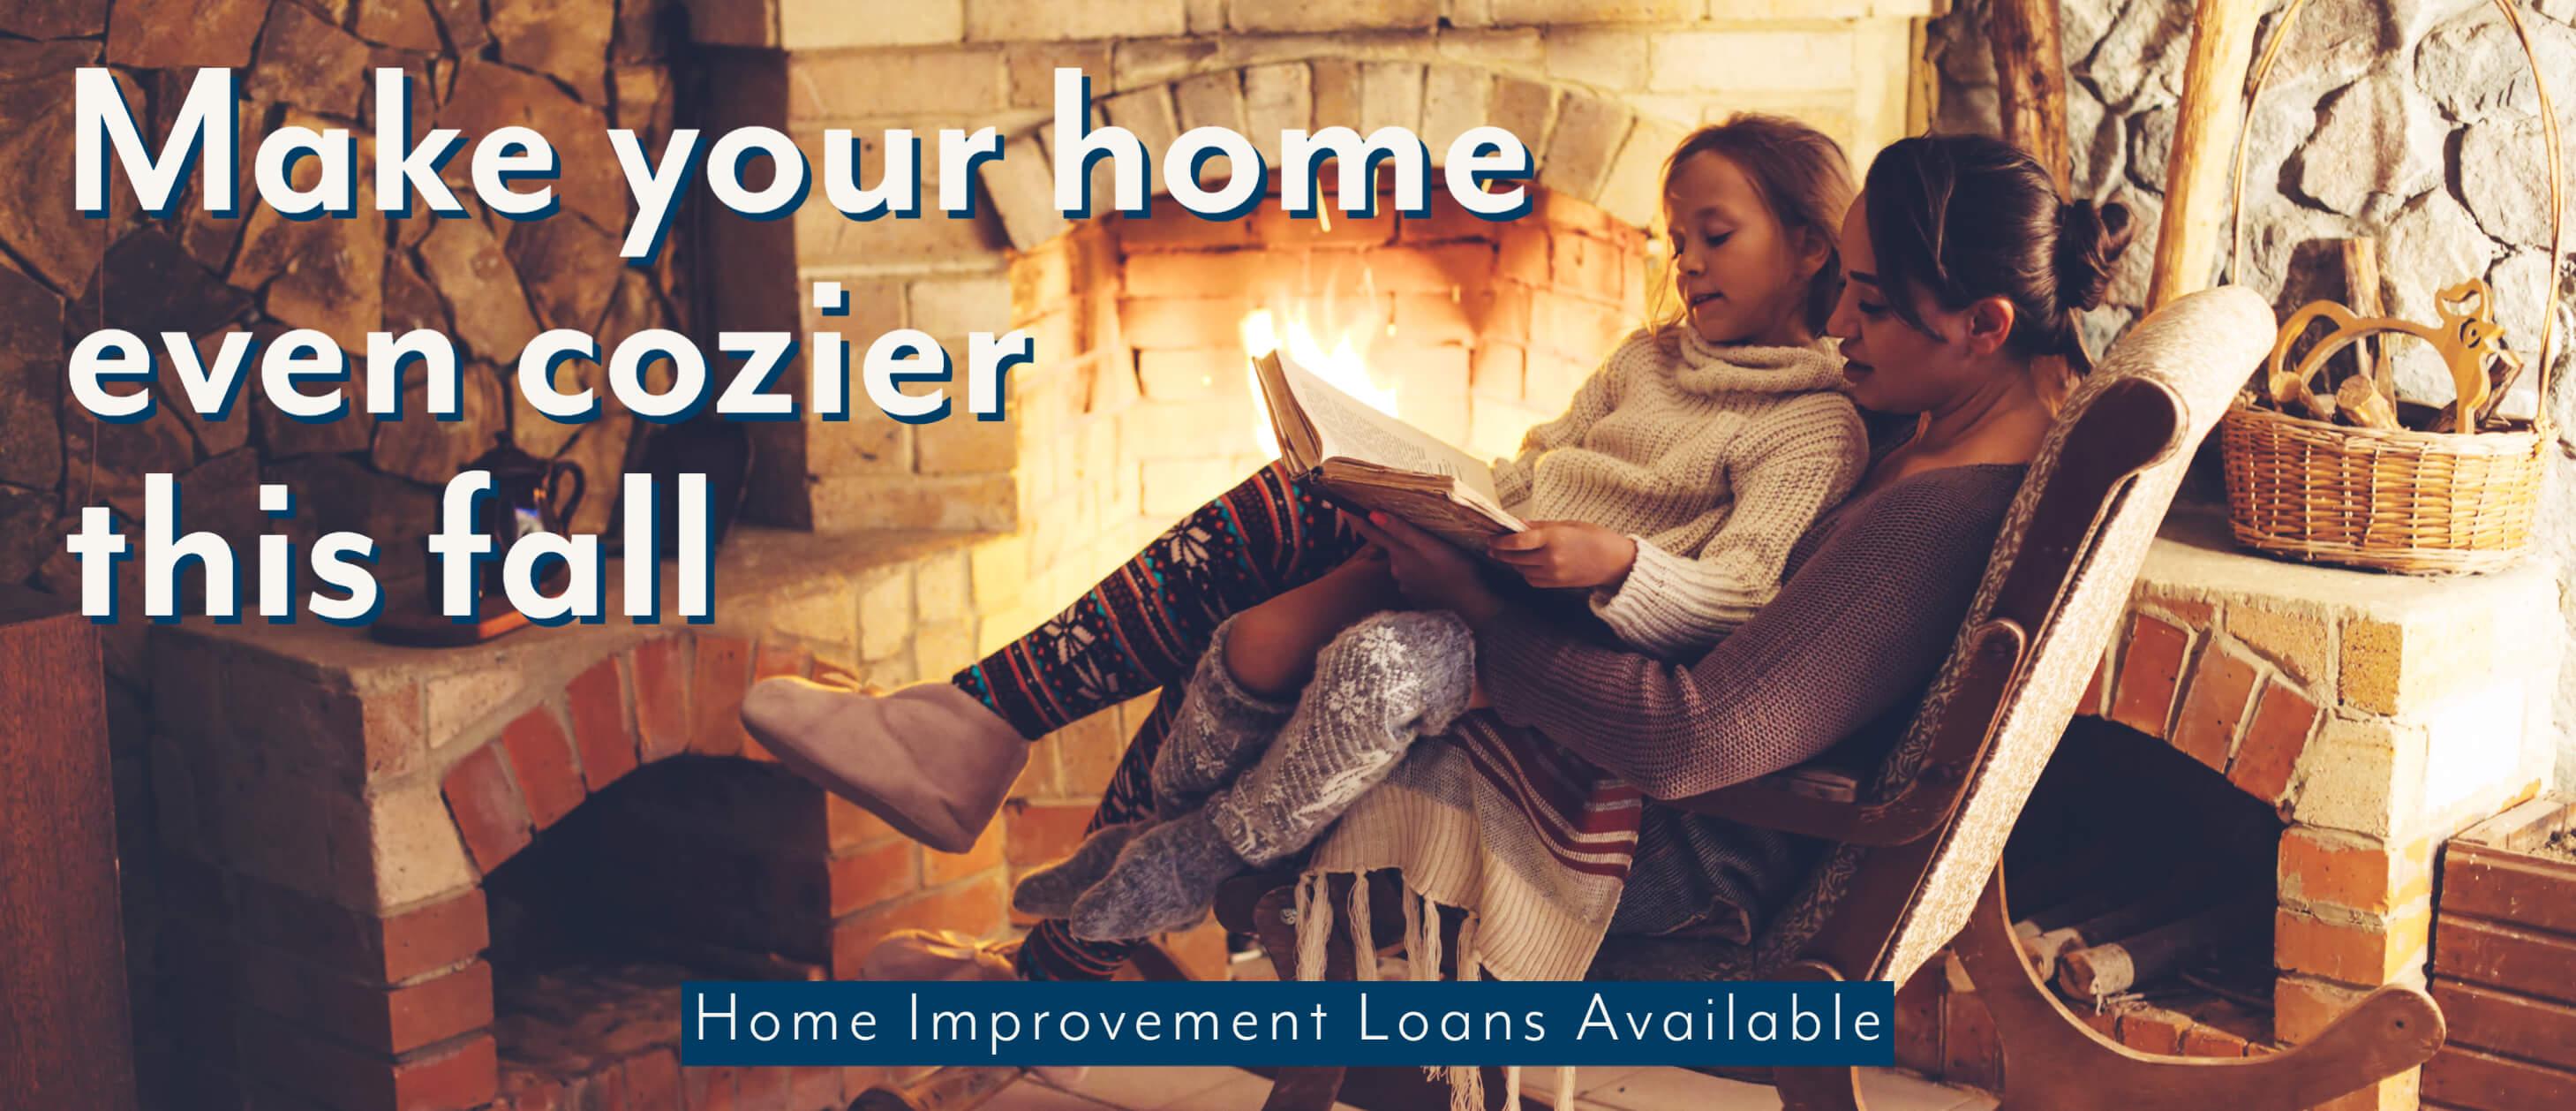 Home Improvement Loans - August